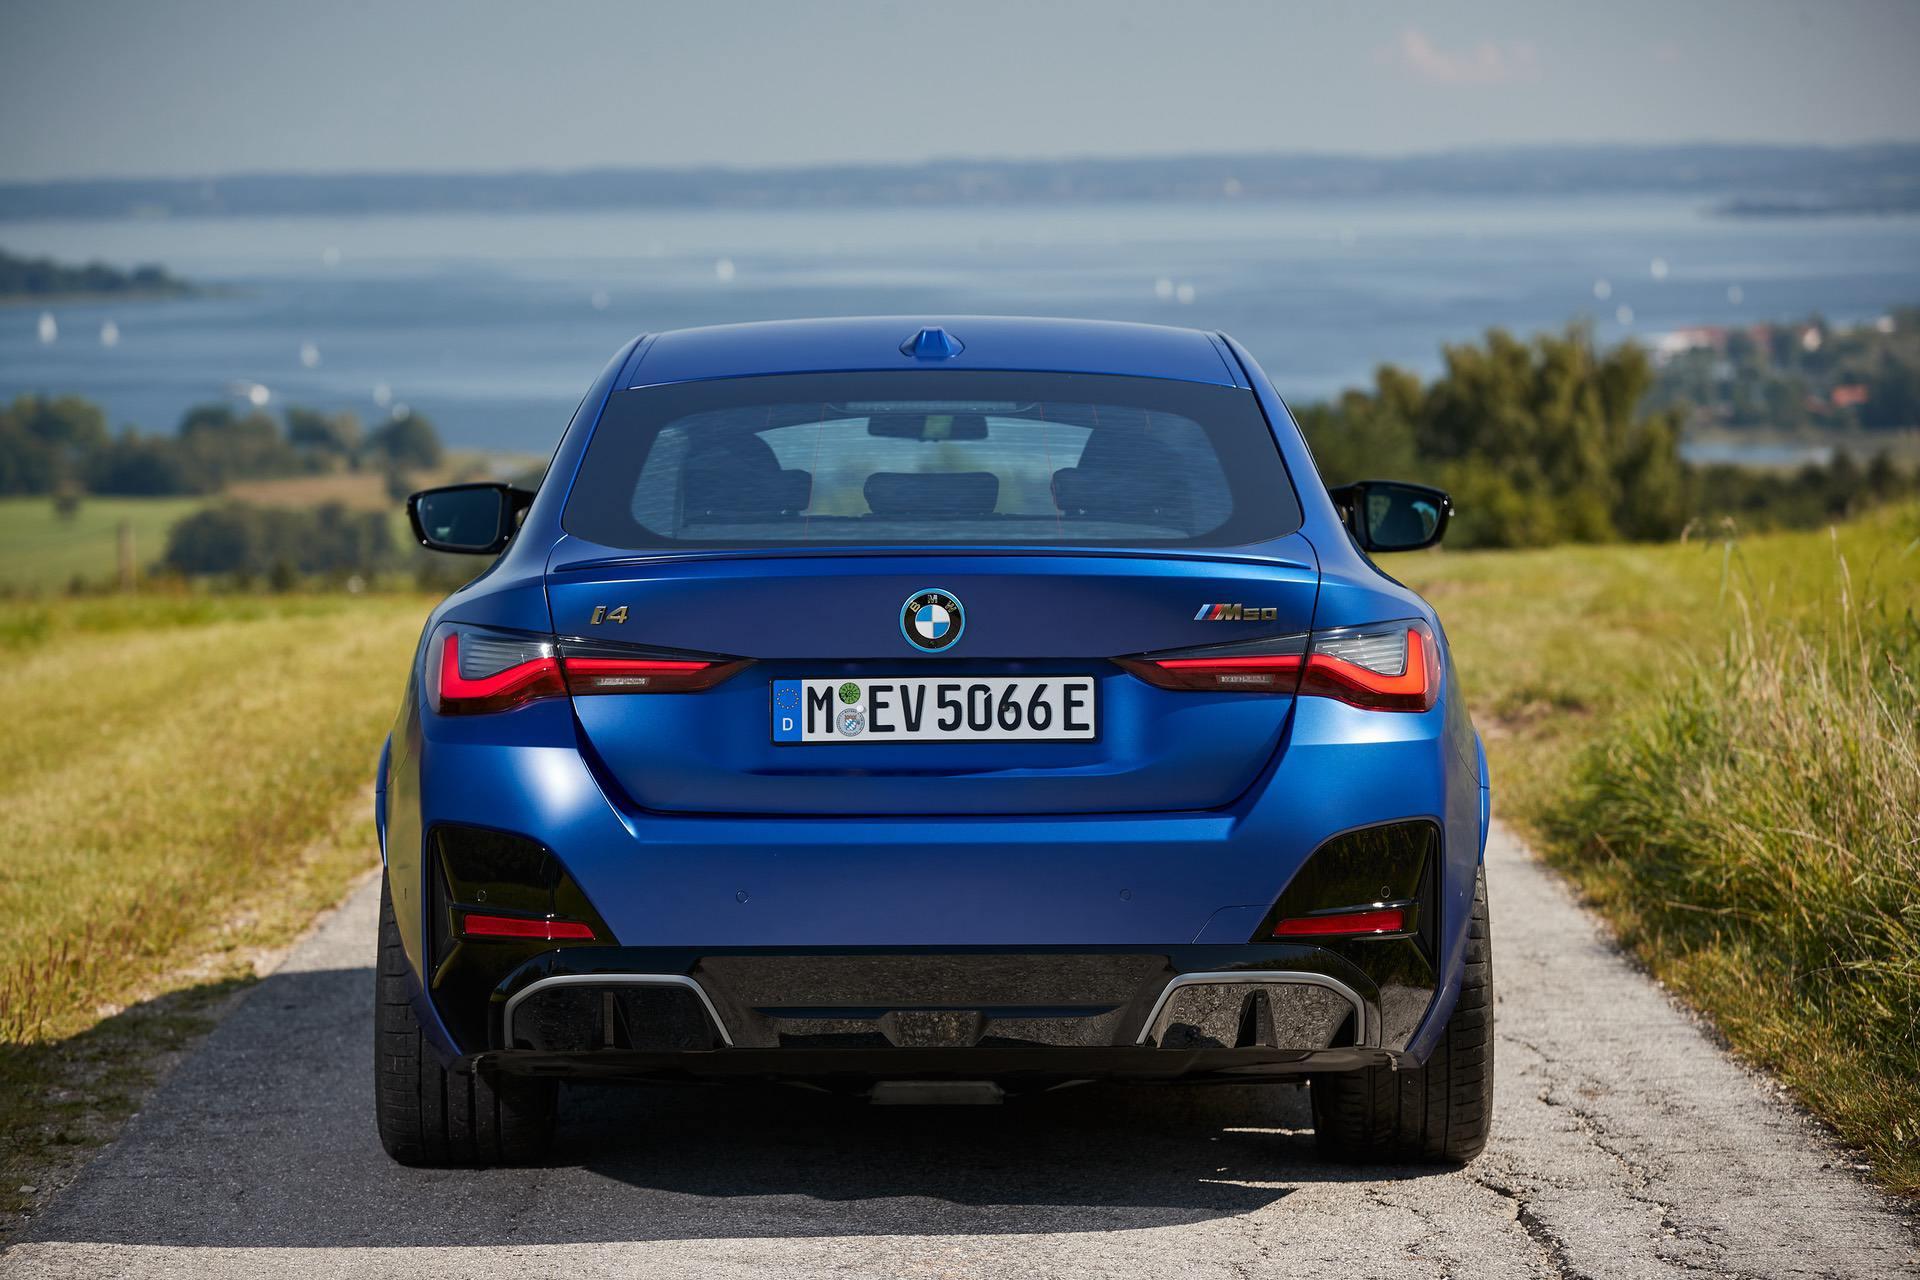 TEST DRIVE: 2022 BMW i4 M50 – Delivering Sheer Driving Pleasure